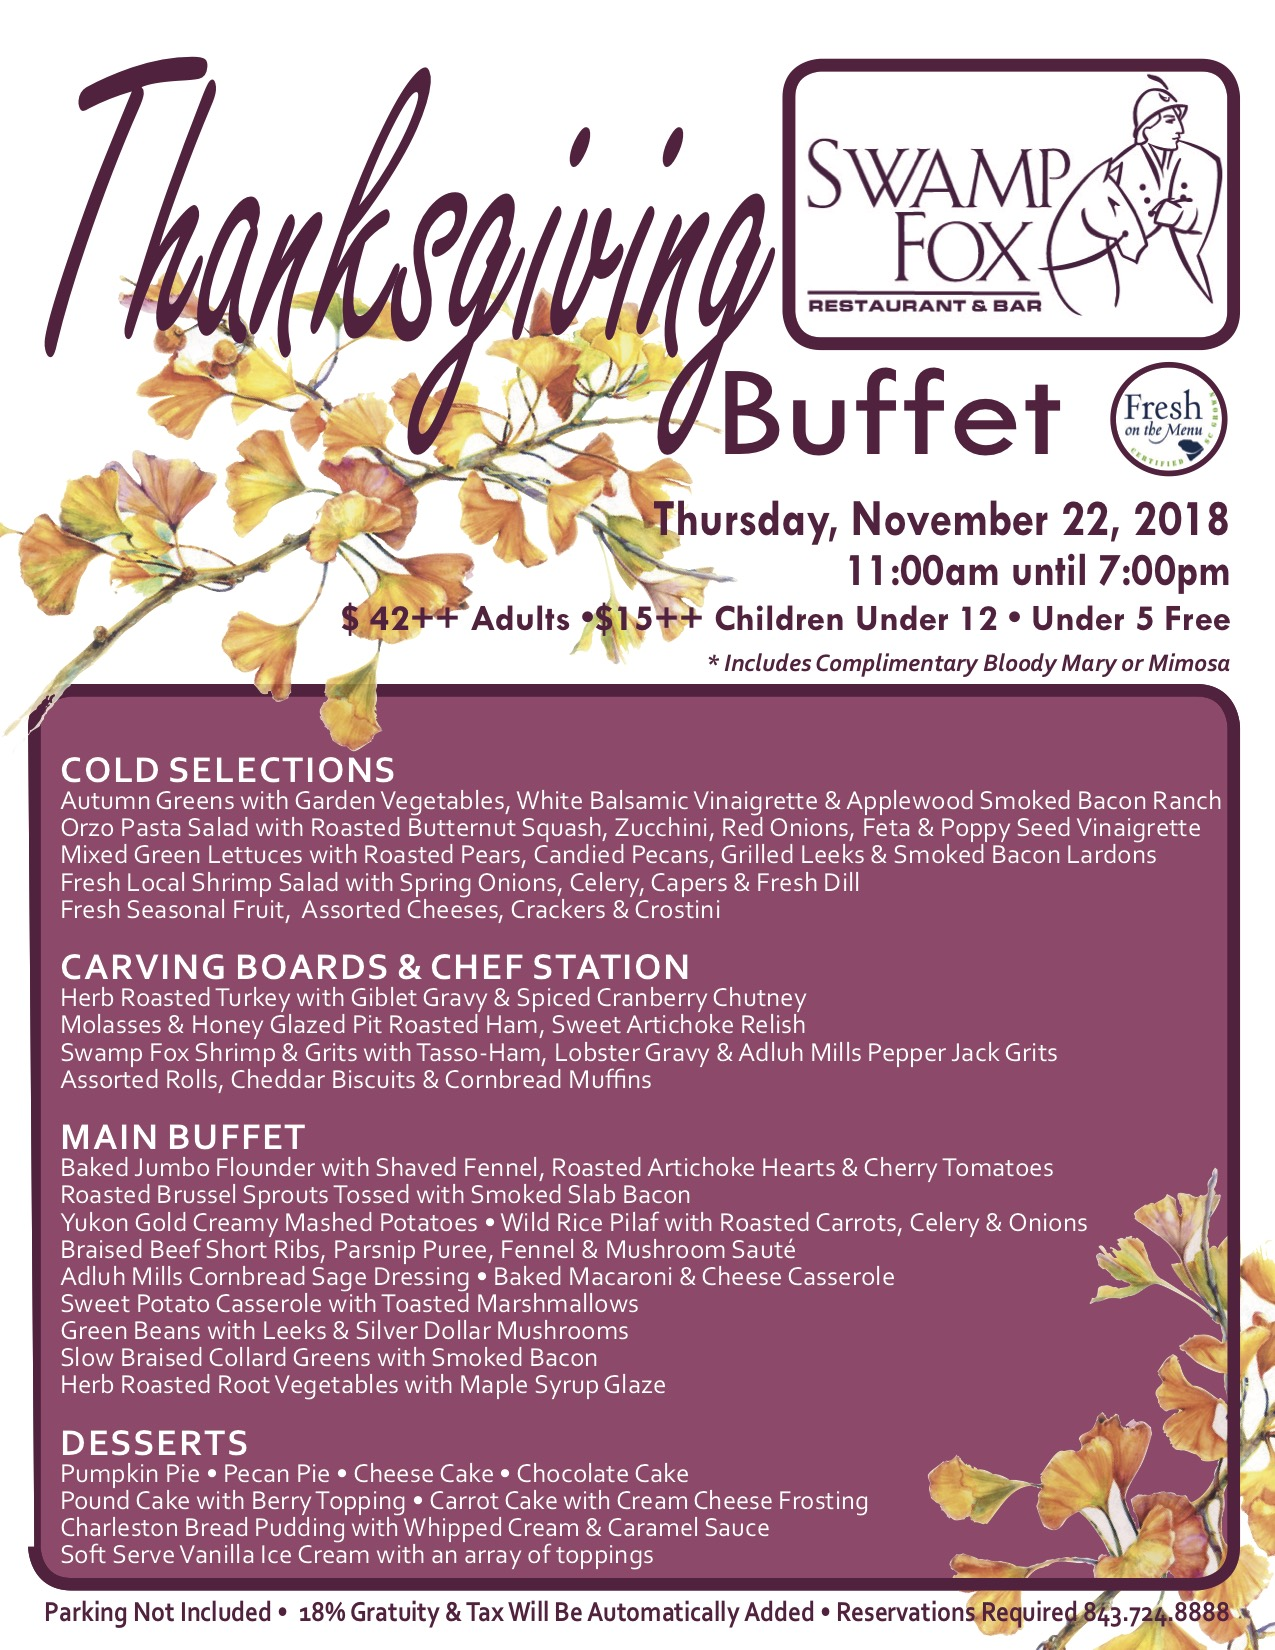 SF-Thanksgiving-Day-2018-8.5x11.jpg